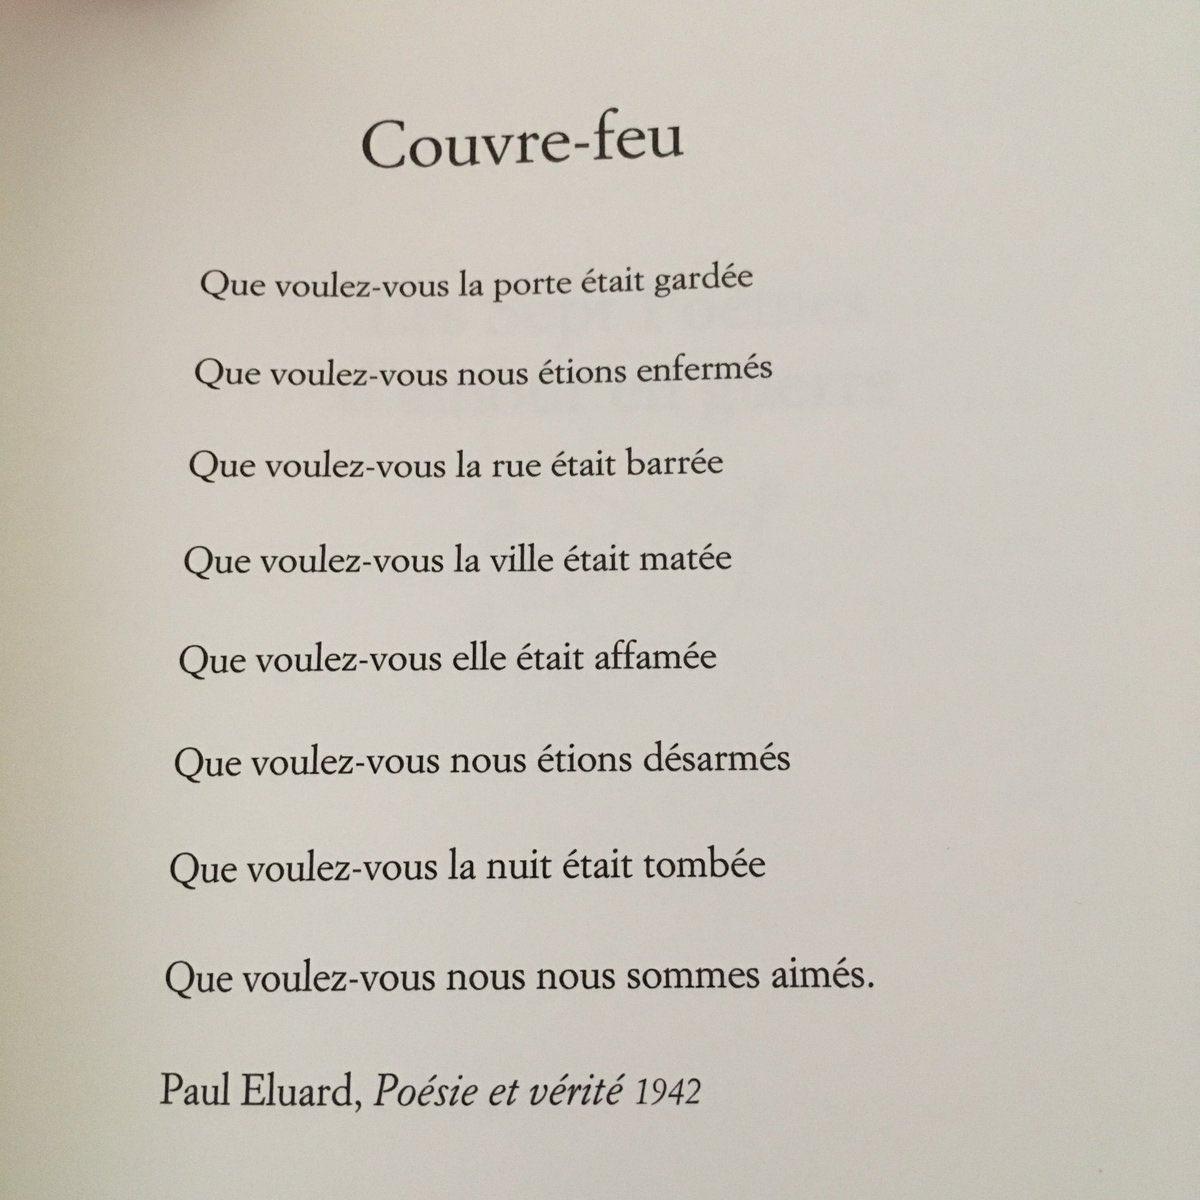 Replying to @TancredeB: Couvre-feu.   Paul Eluard.  Un peu de poésie ❤️